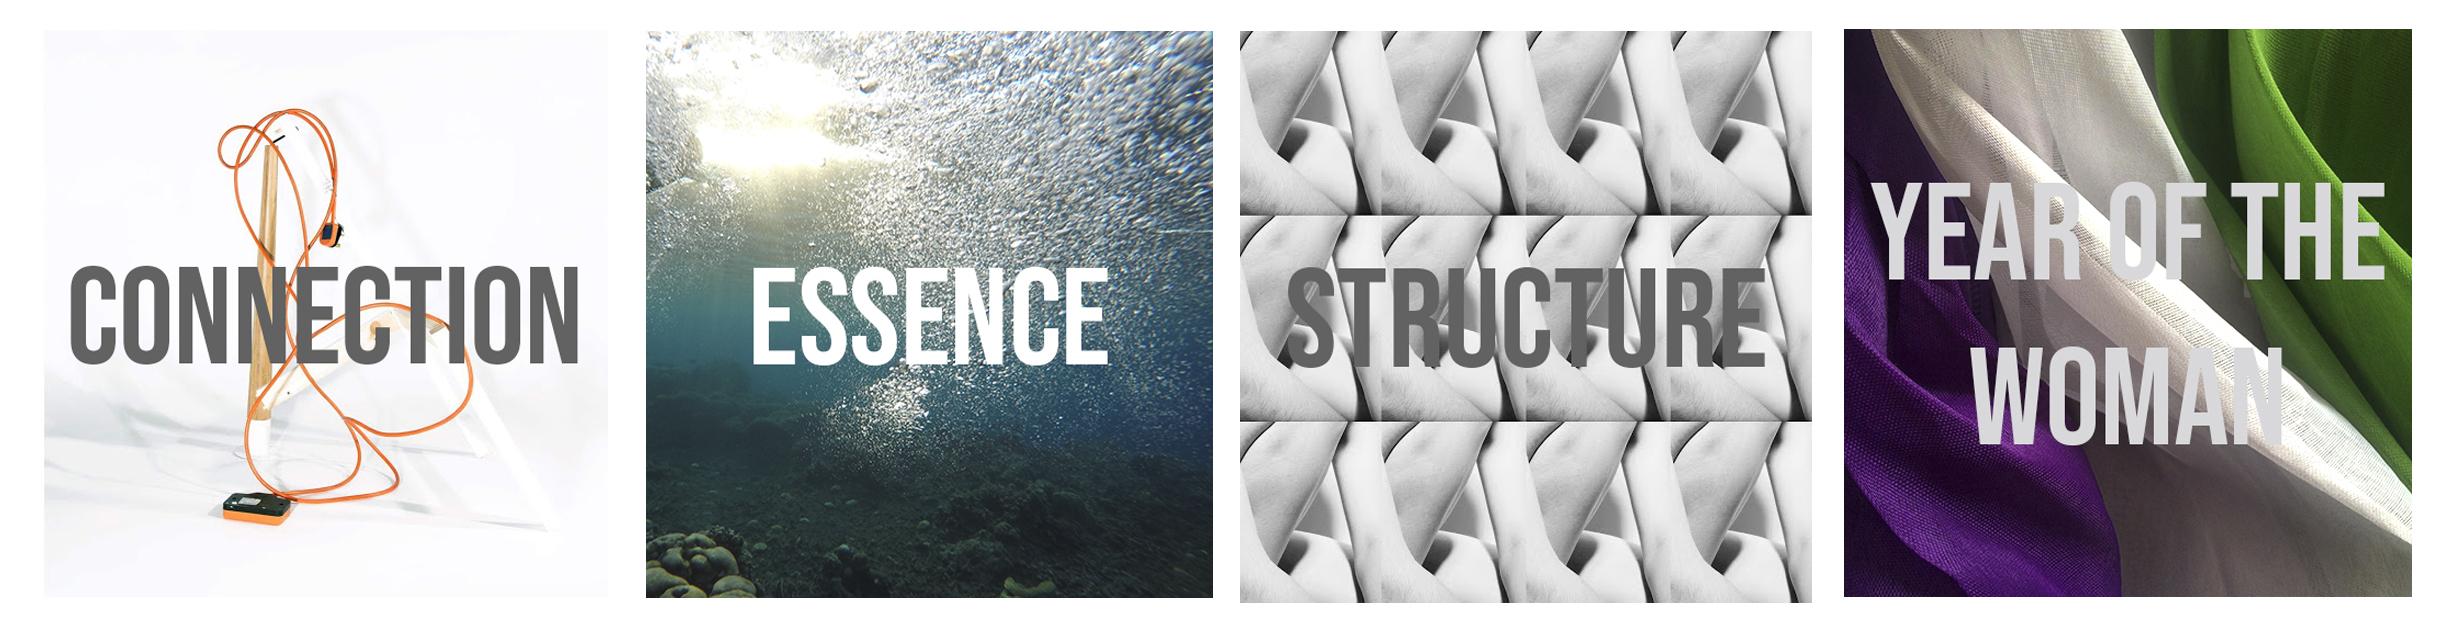 The 4 themes in a row.jpg